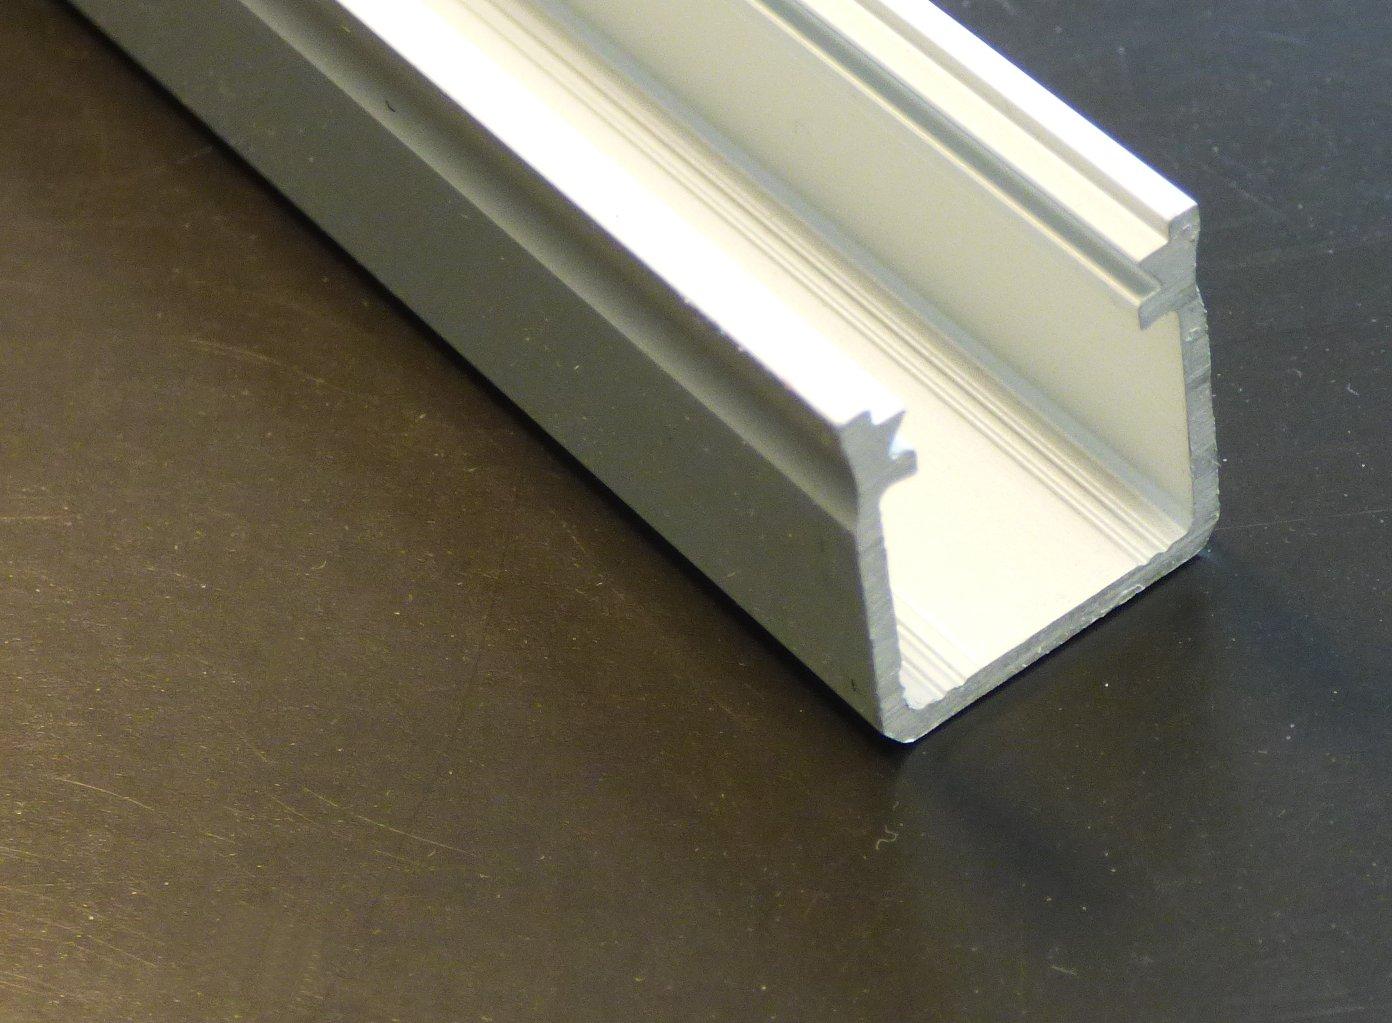 alu profil hoch 1m silbern eloxiert 16x18mm leuchten. Black Bedroom Furniture Sets. Home Design Ideas